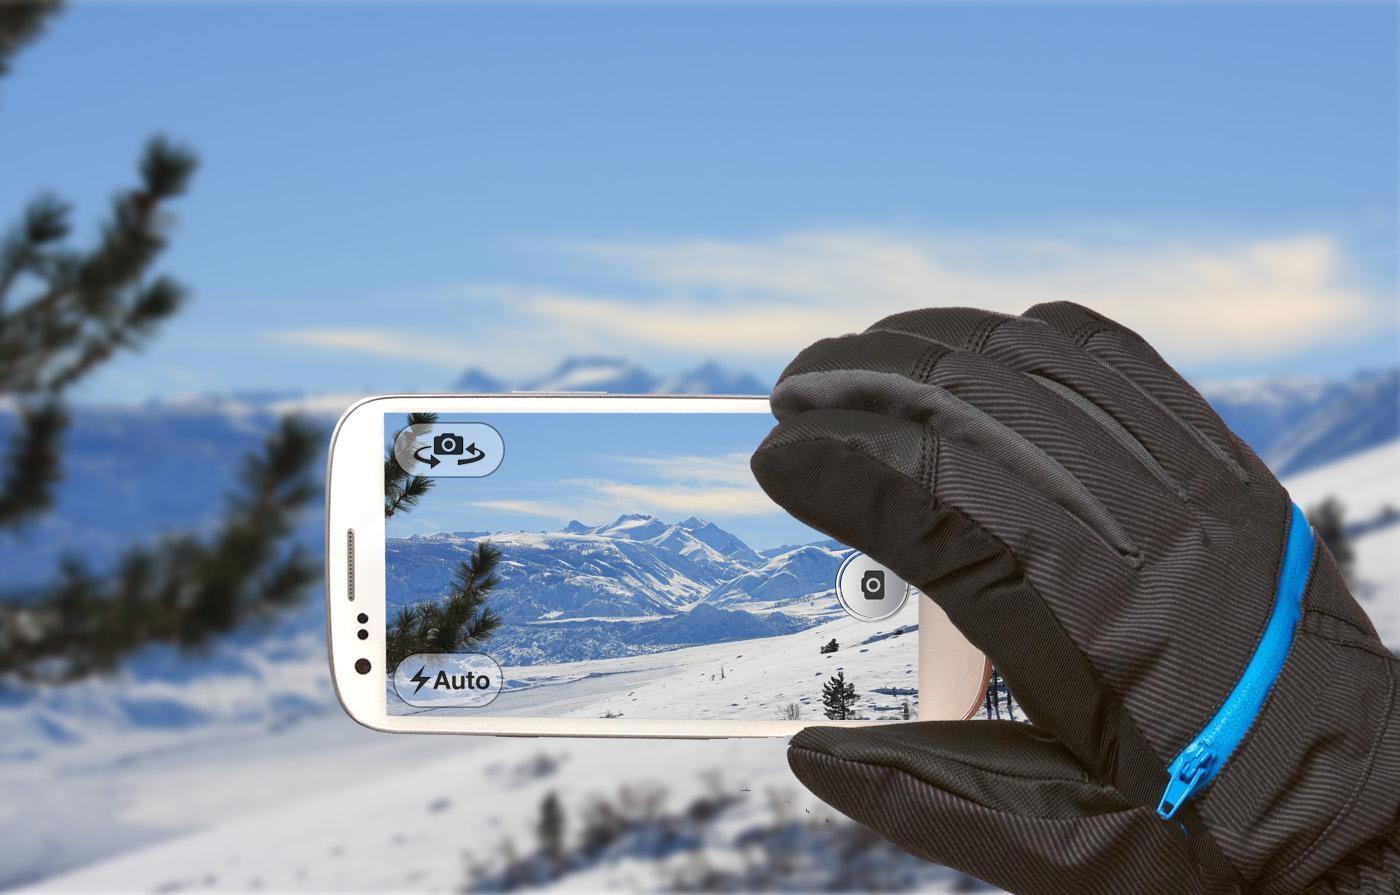 Whistle Camera - Selfie & More - Imagem 1 do software